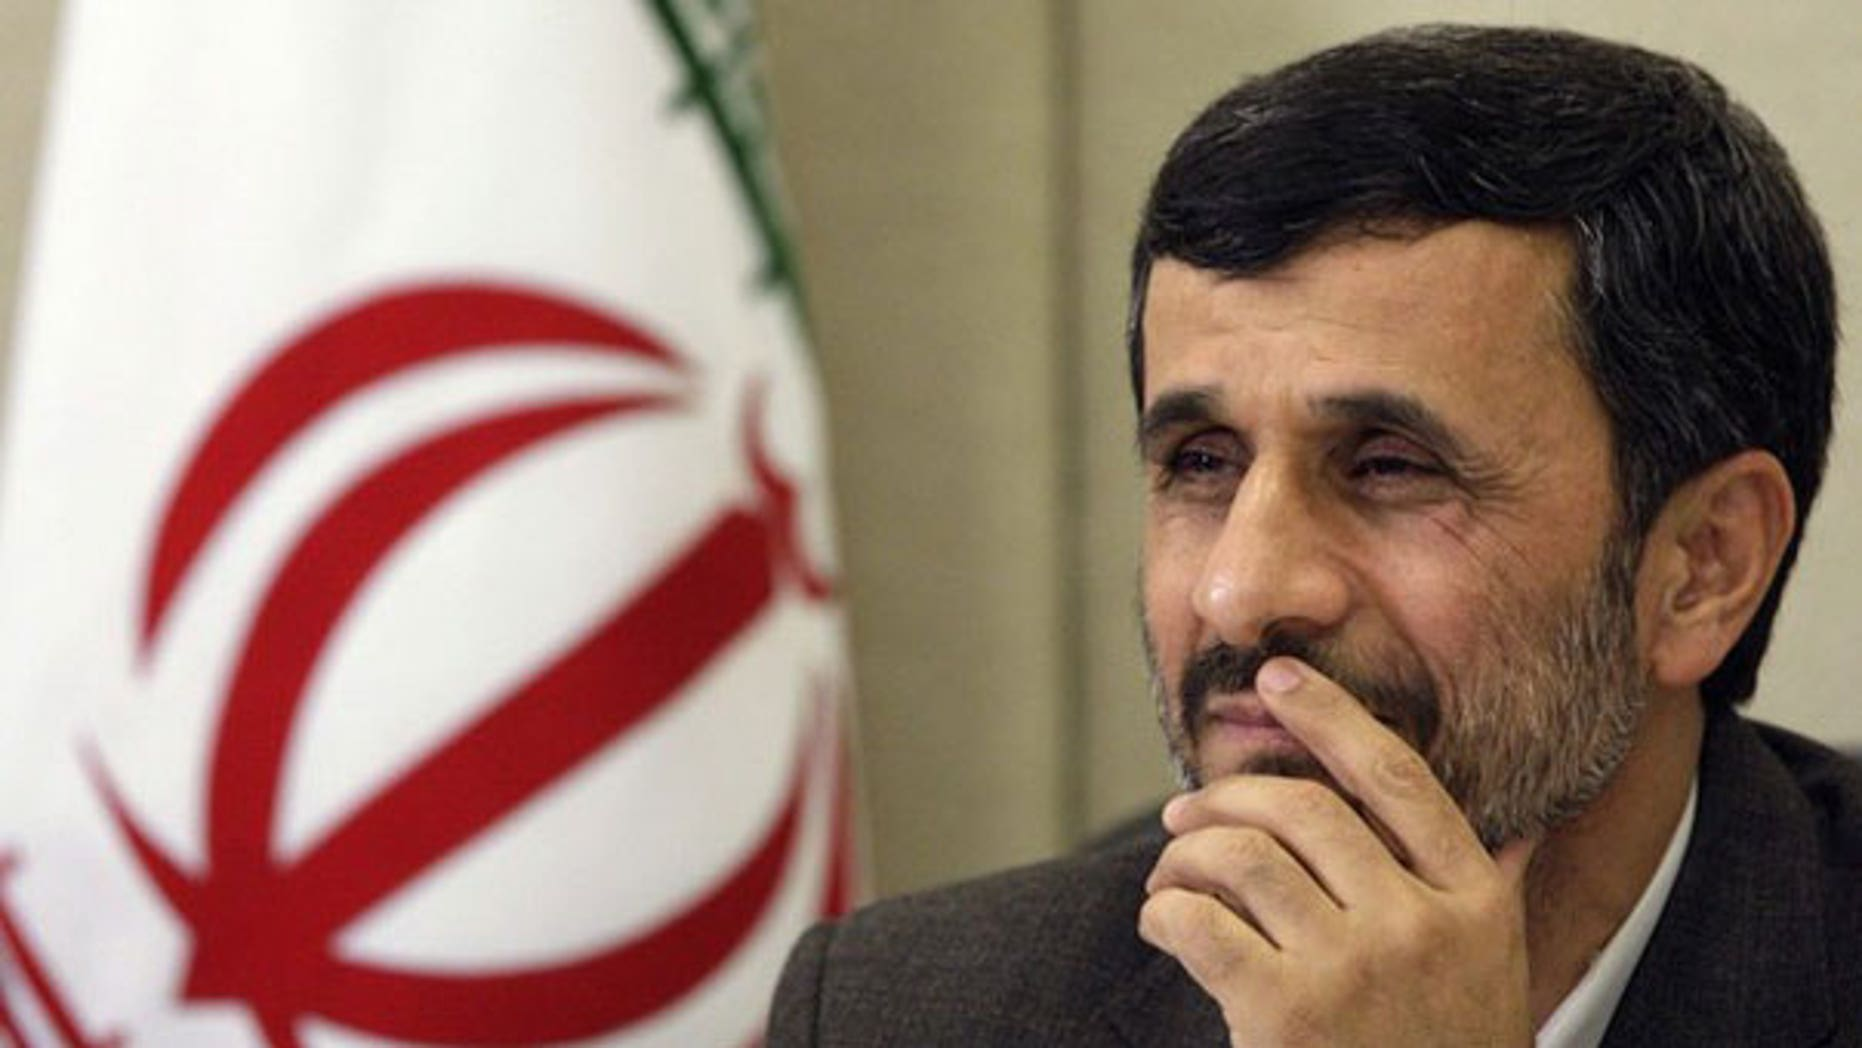 Nov. 23: Iran's President Mahmoud Ahmadinejad attends a news conference in Brazil (Reuters).